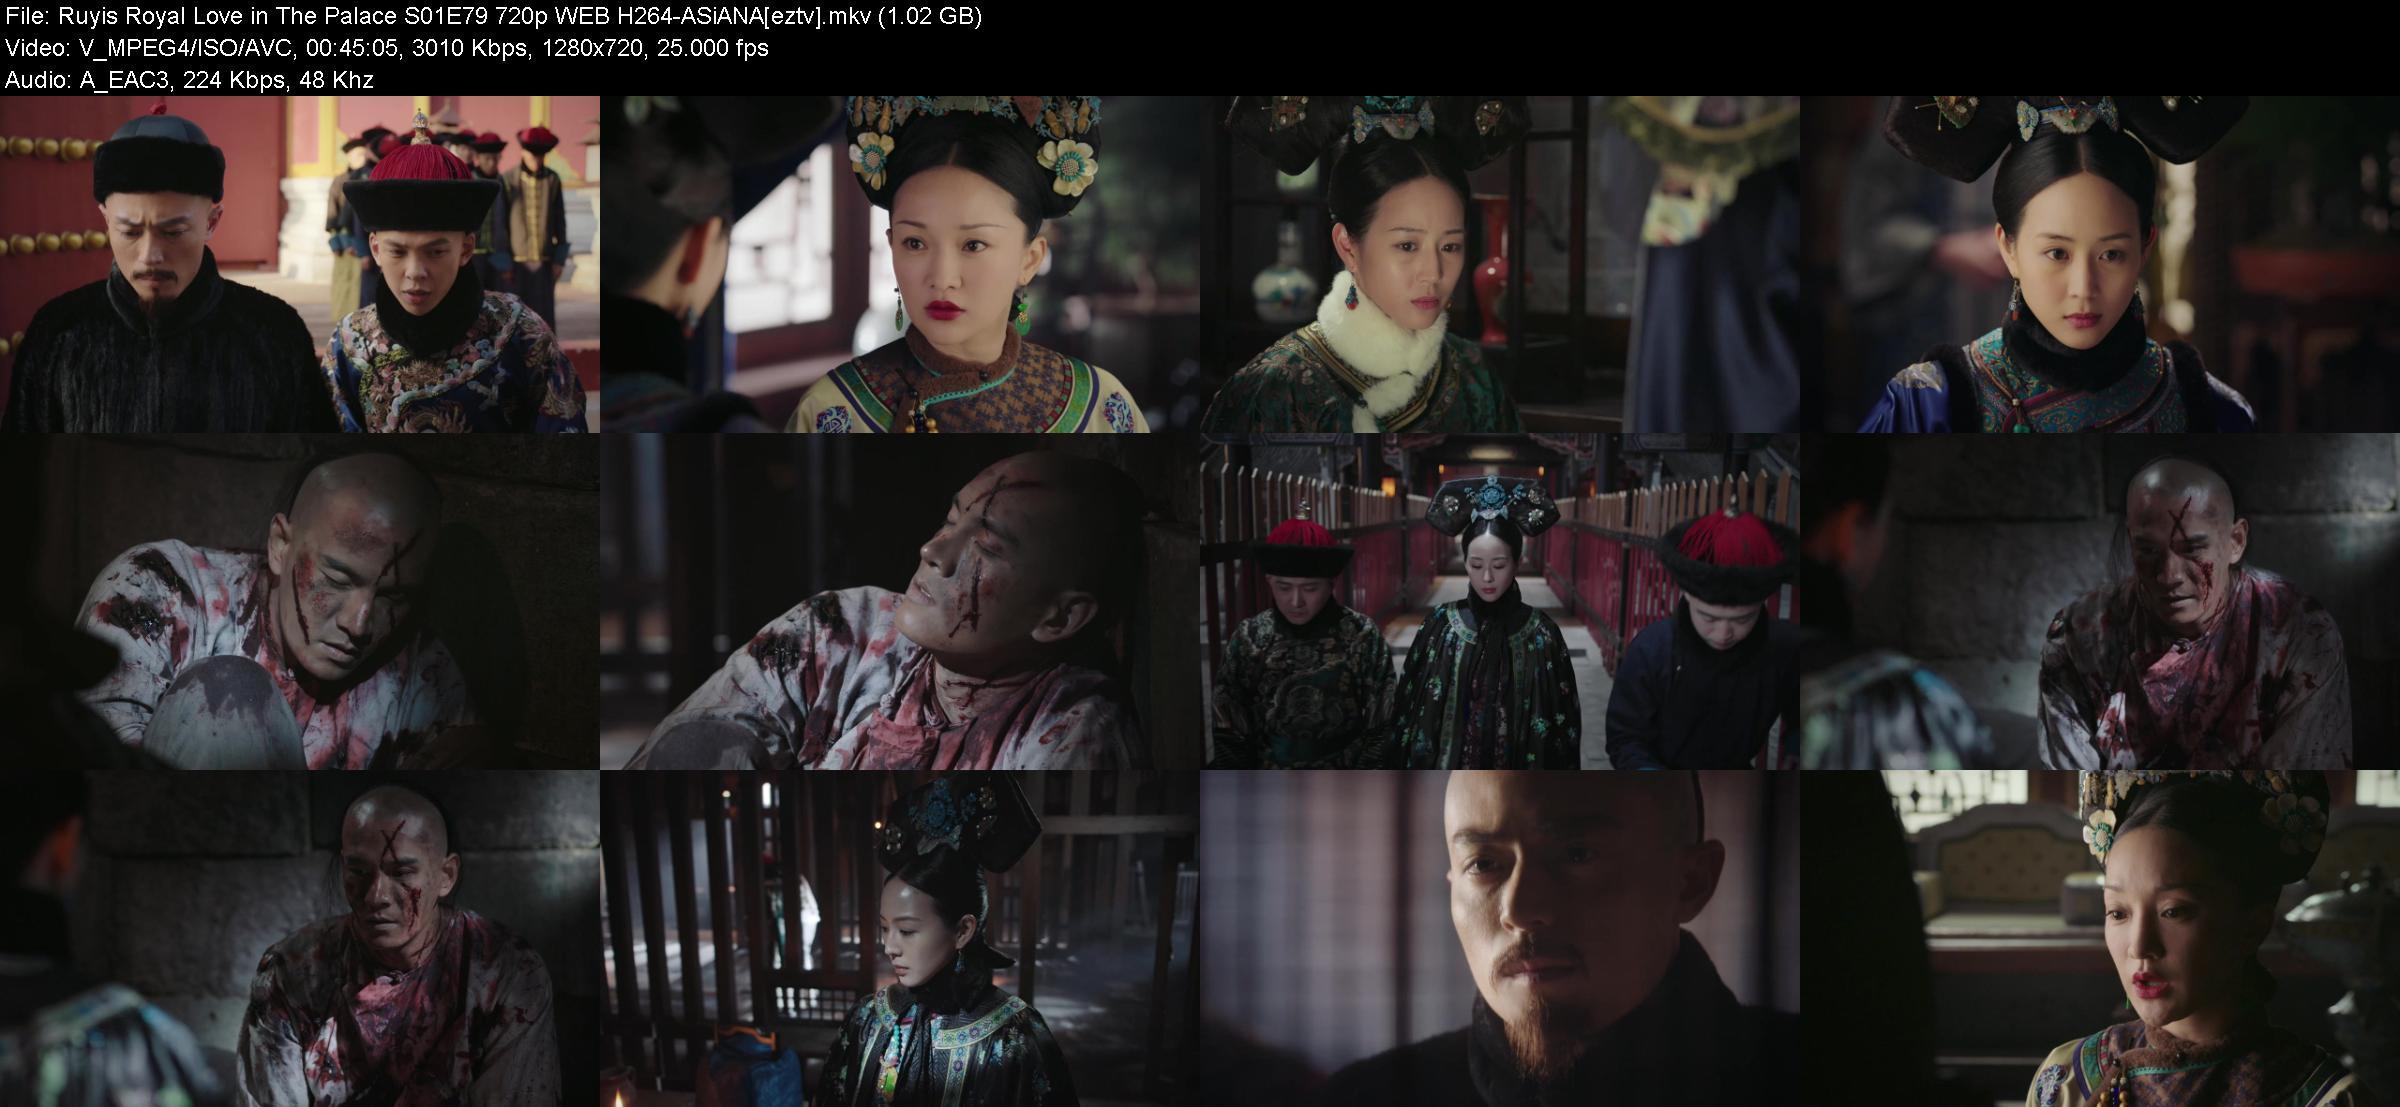 Ruyis Royal Love in The Palace S01E79 720p WEB H264-ASiANA